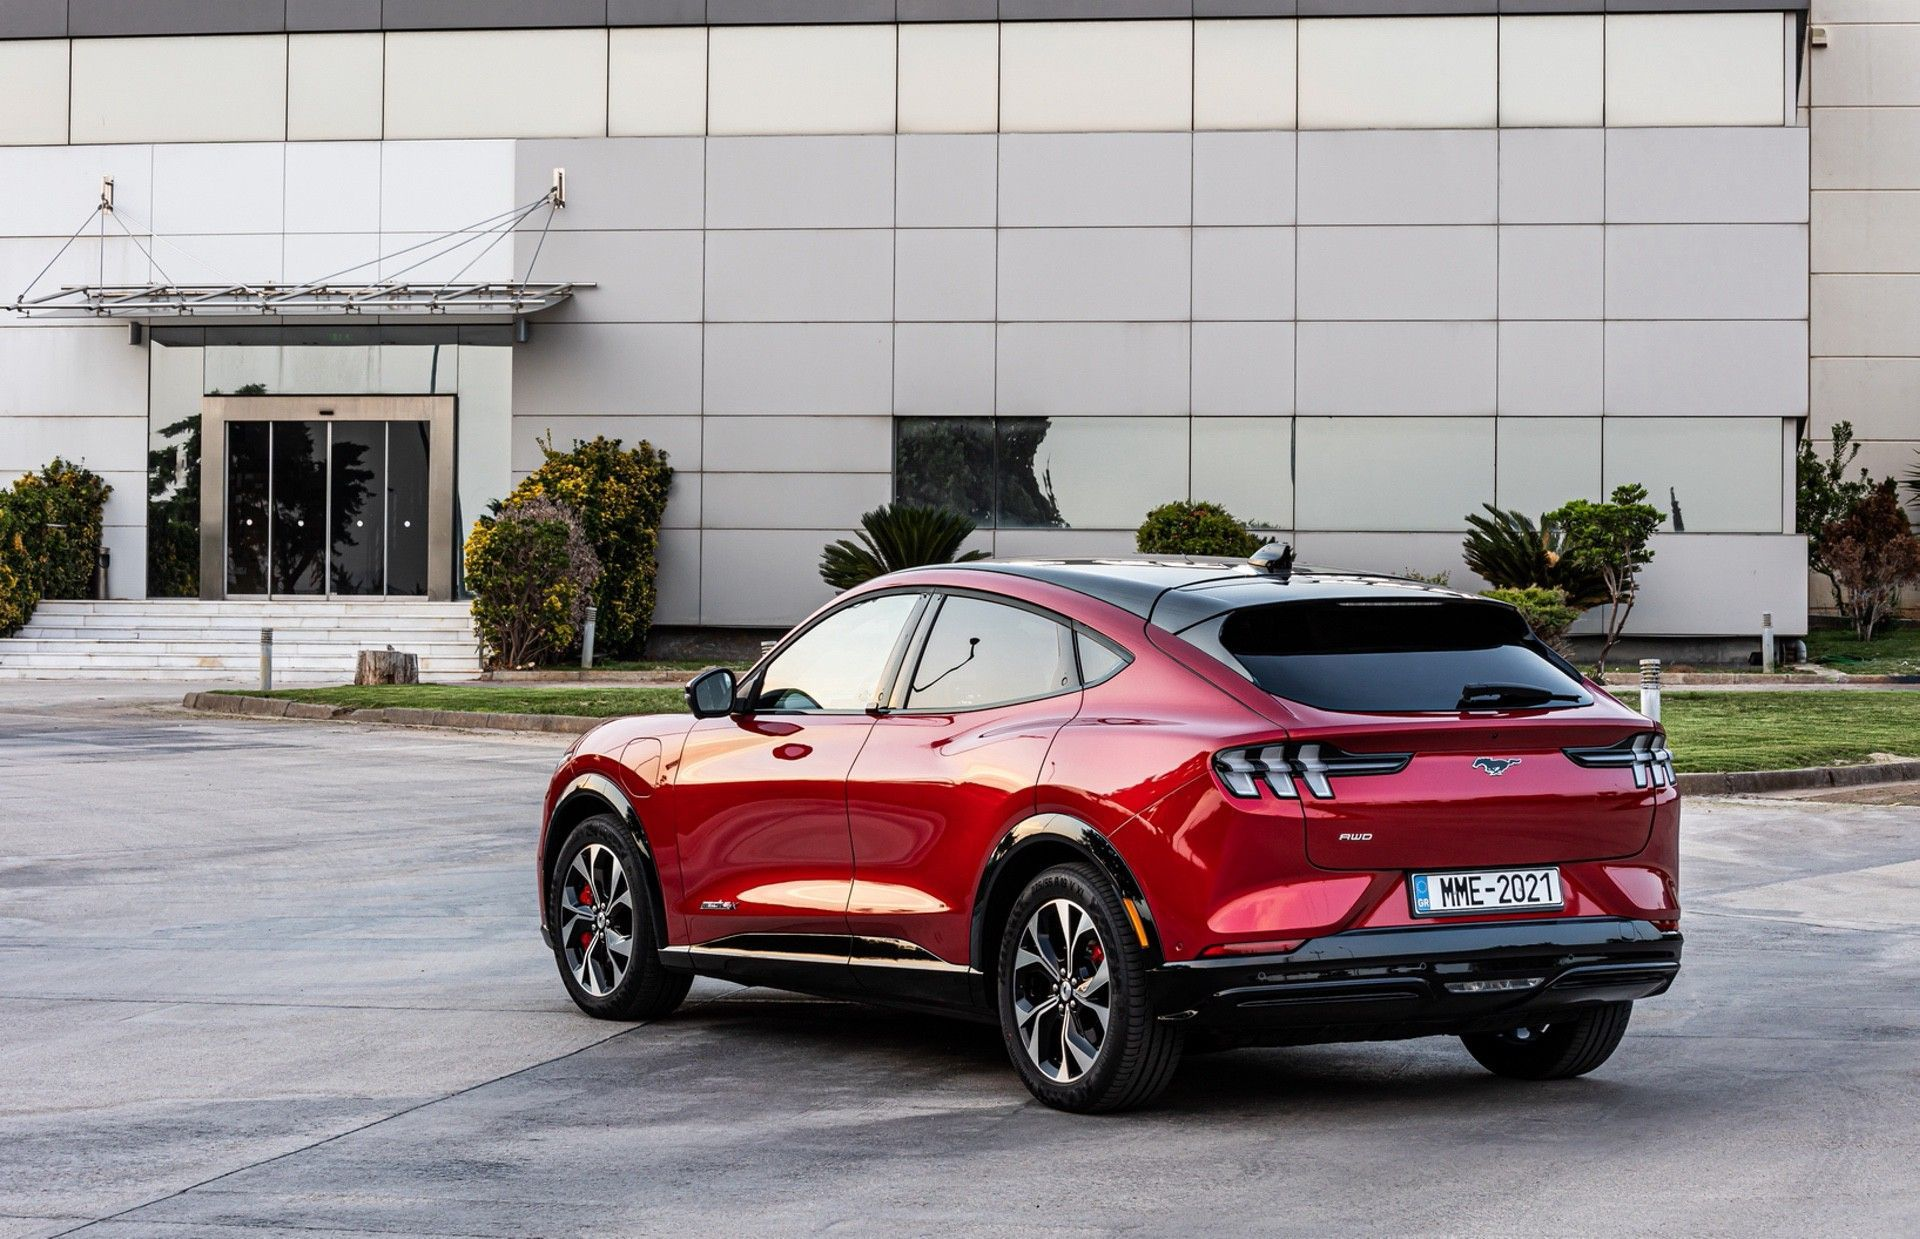 Ford_Mustang_Mach-E_greek_presskit-0049